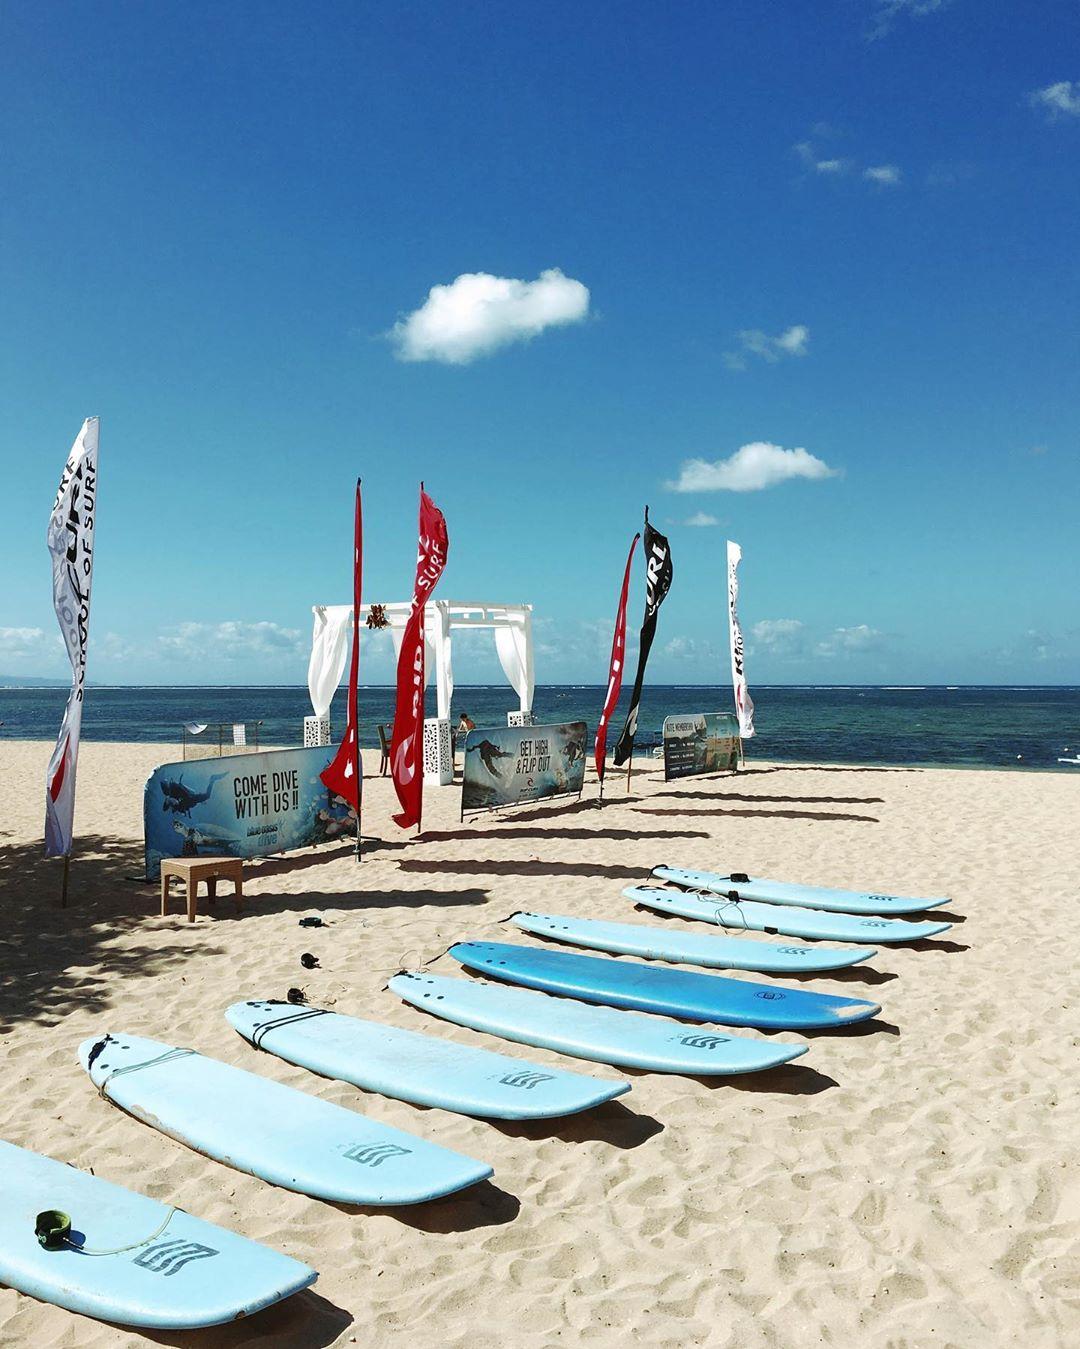 bali luxury hotels - intercontinental bali rip curl school of surf